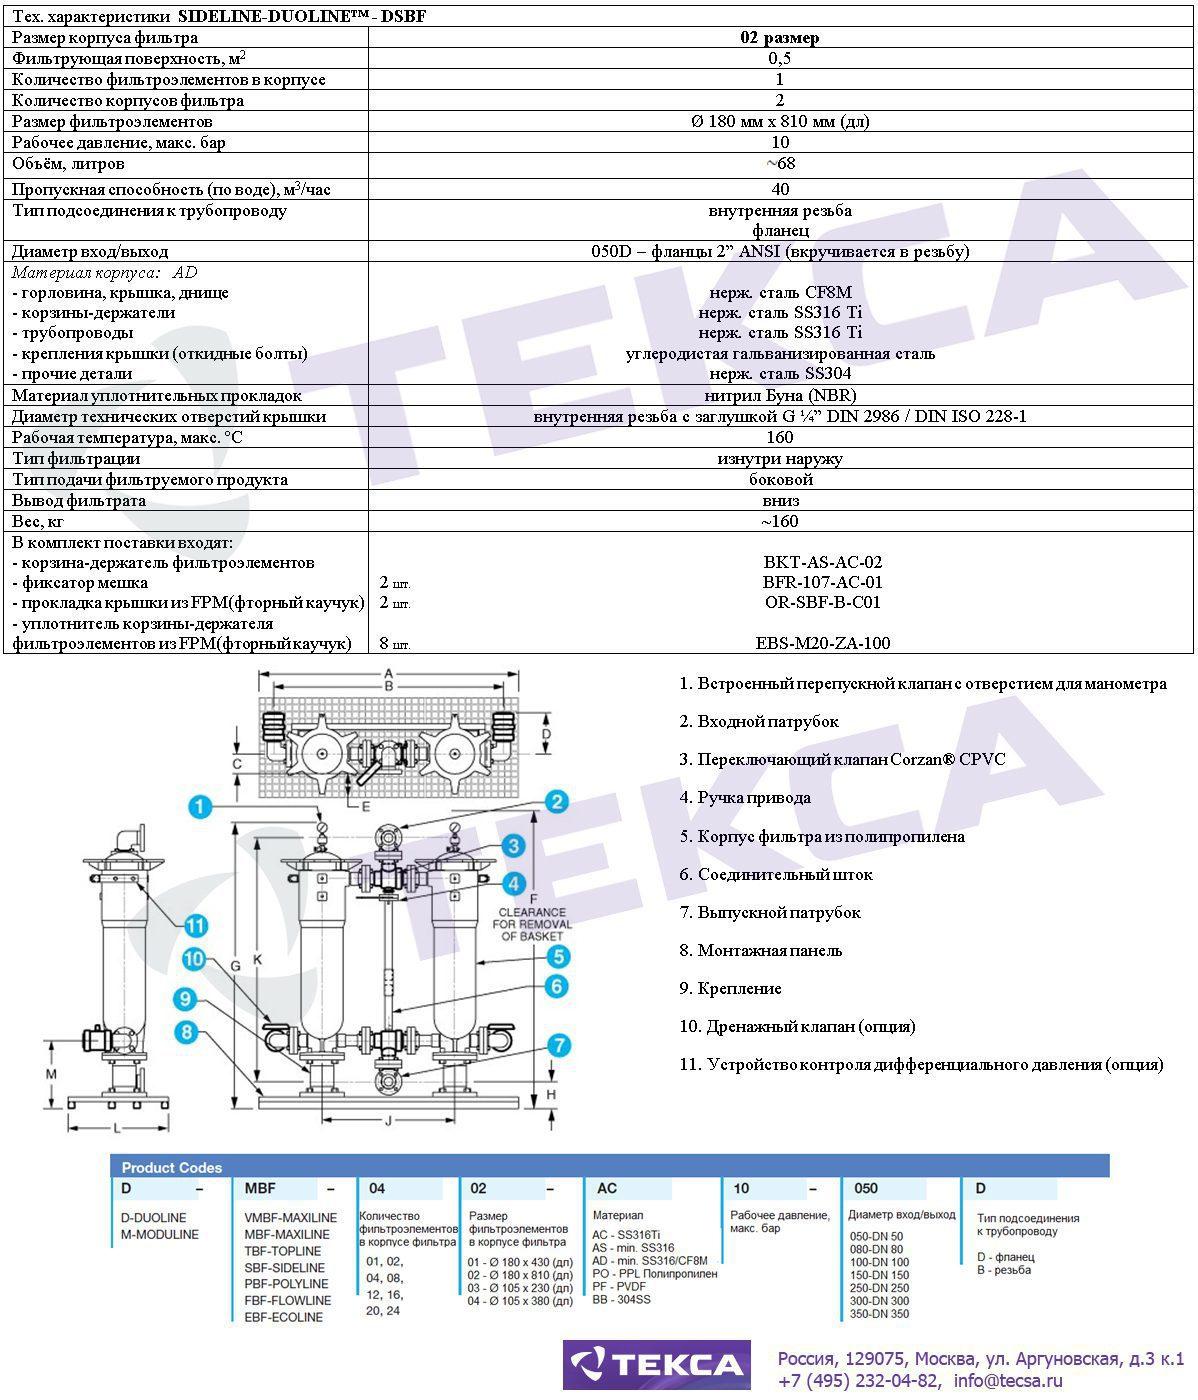 Технические характеристики корпуса фильтра SIDELINE-DUOLINE